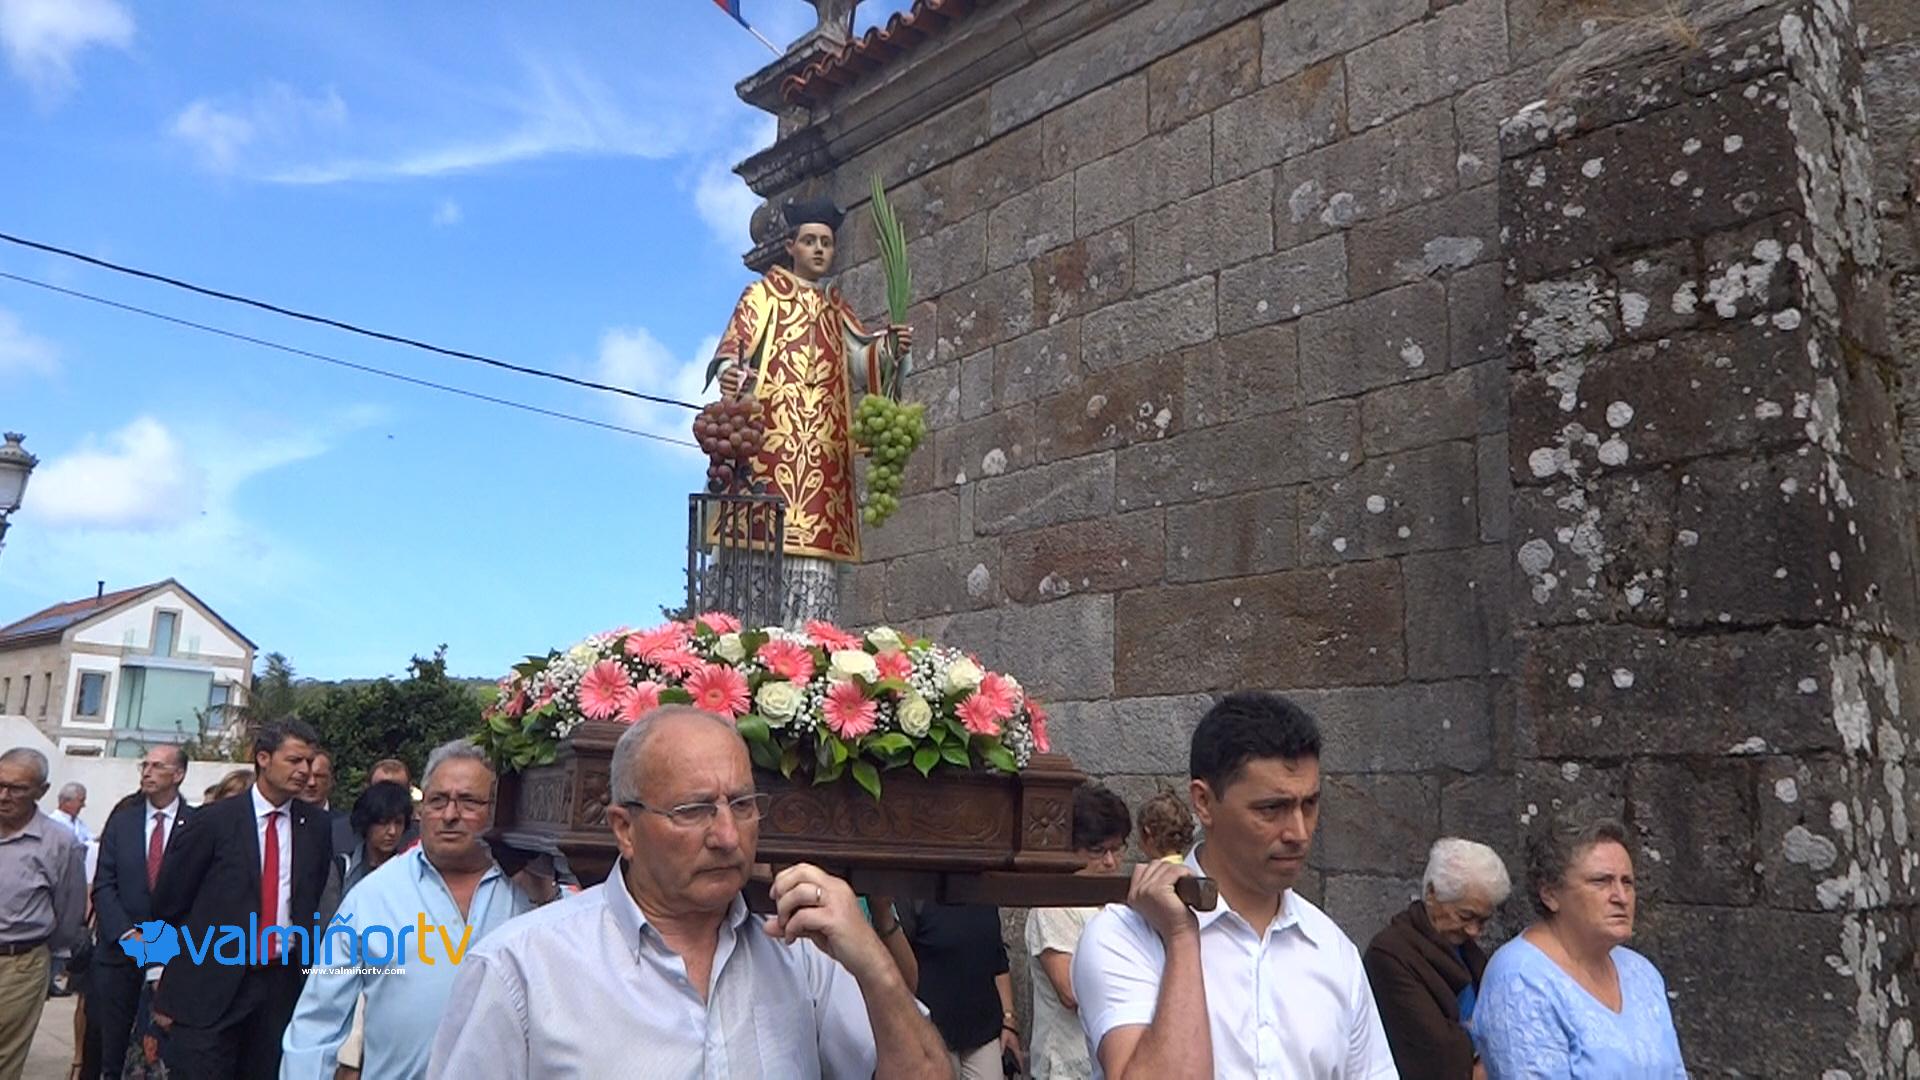 PROCESIÓN DE SAN LOURENZO DE BELESAR